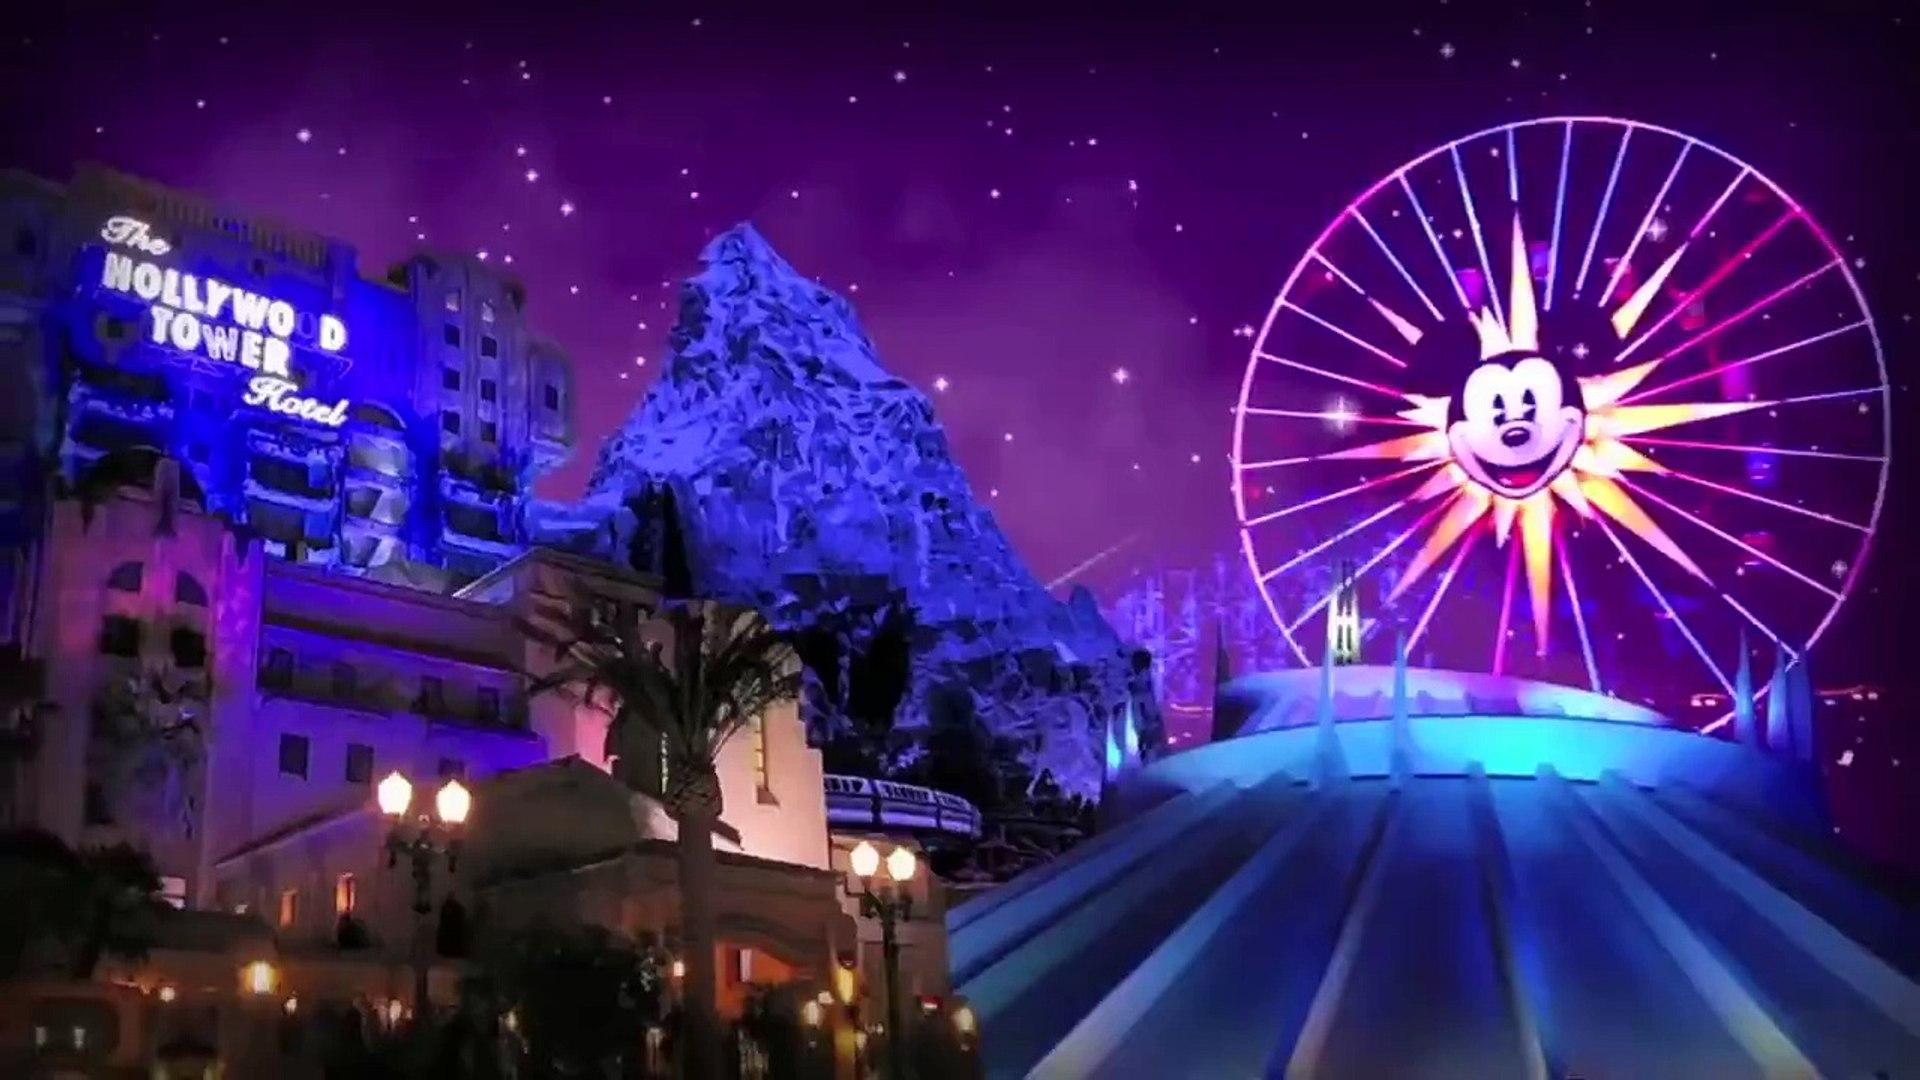 Universal Studios Orlando Rides Flight of the Hippogriff Wizarding World of Harry Potter